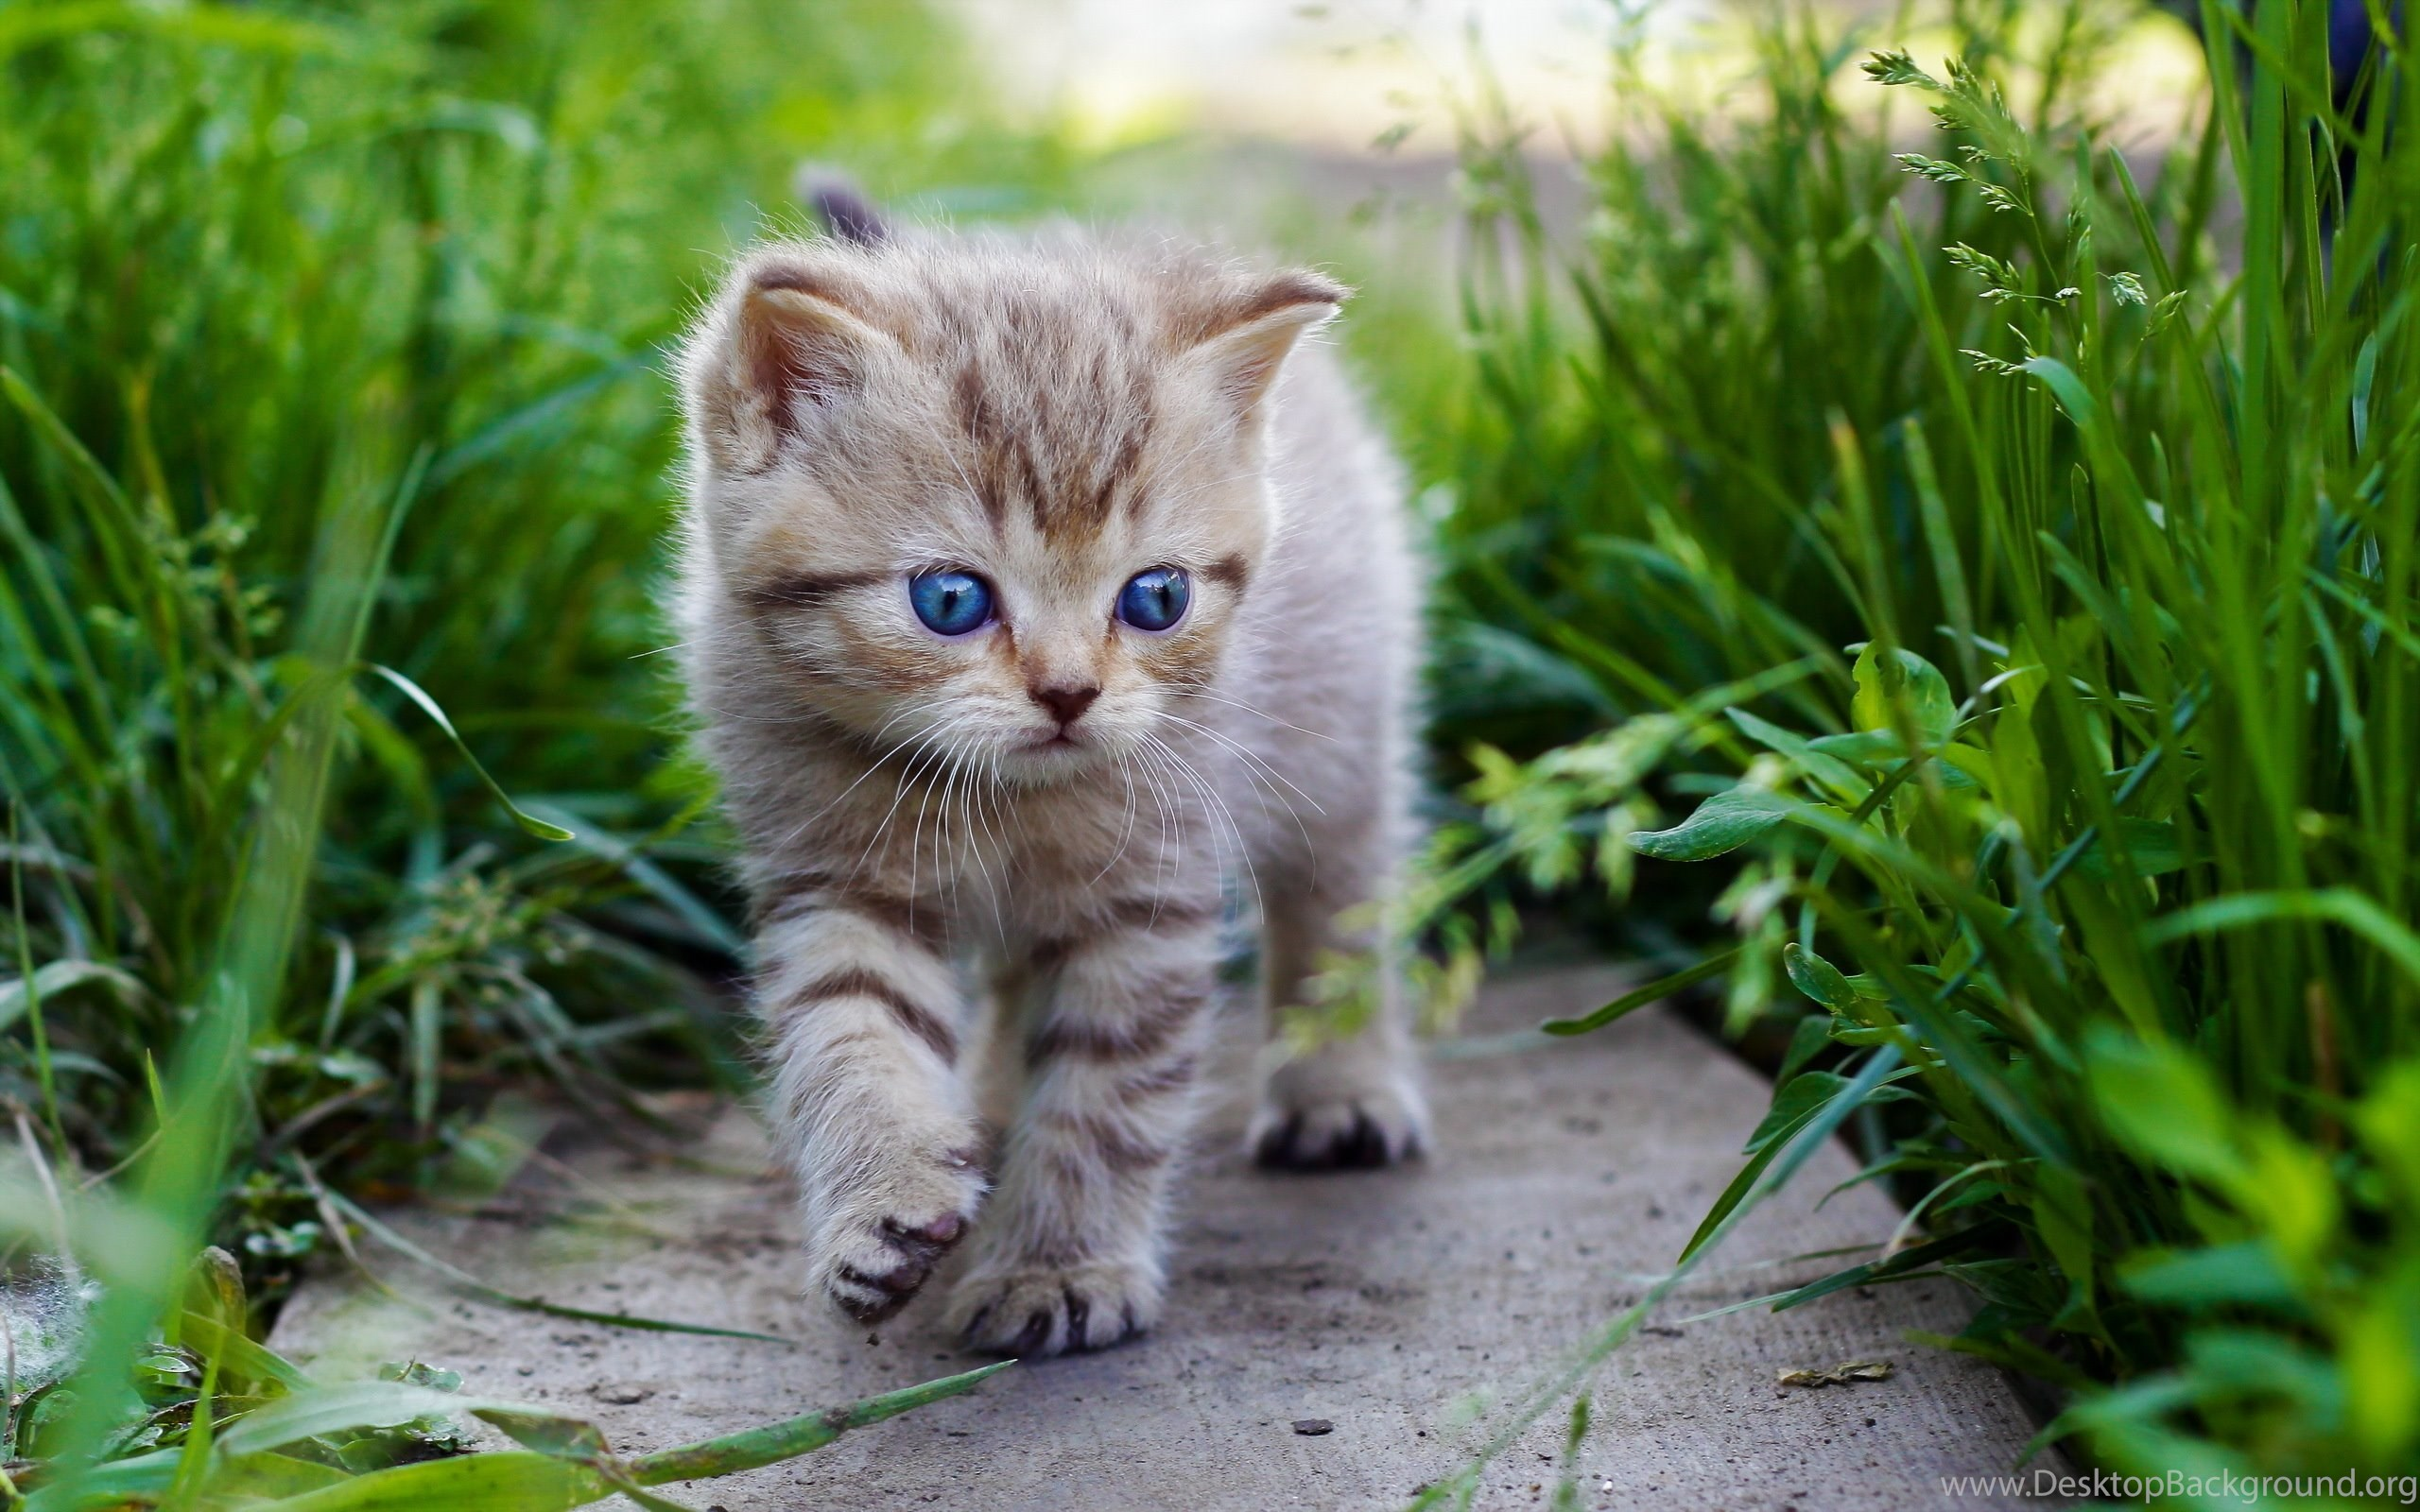 Cute Cats And Kittens Wallpaper Desktop Background